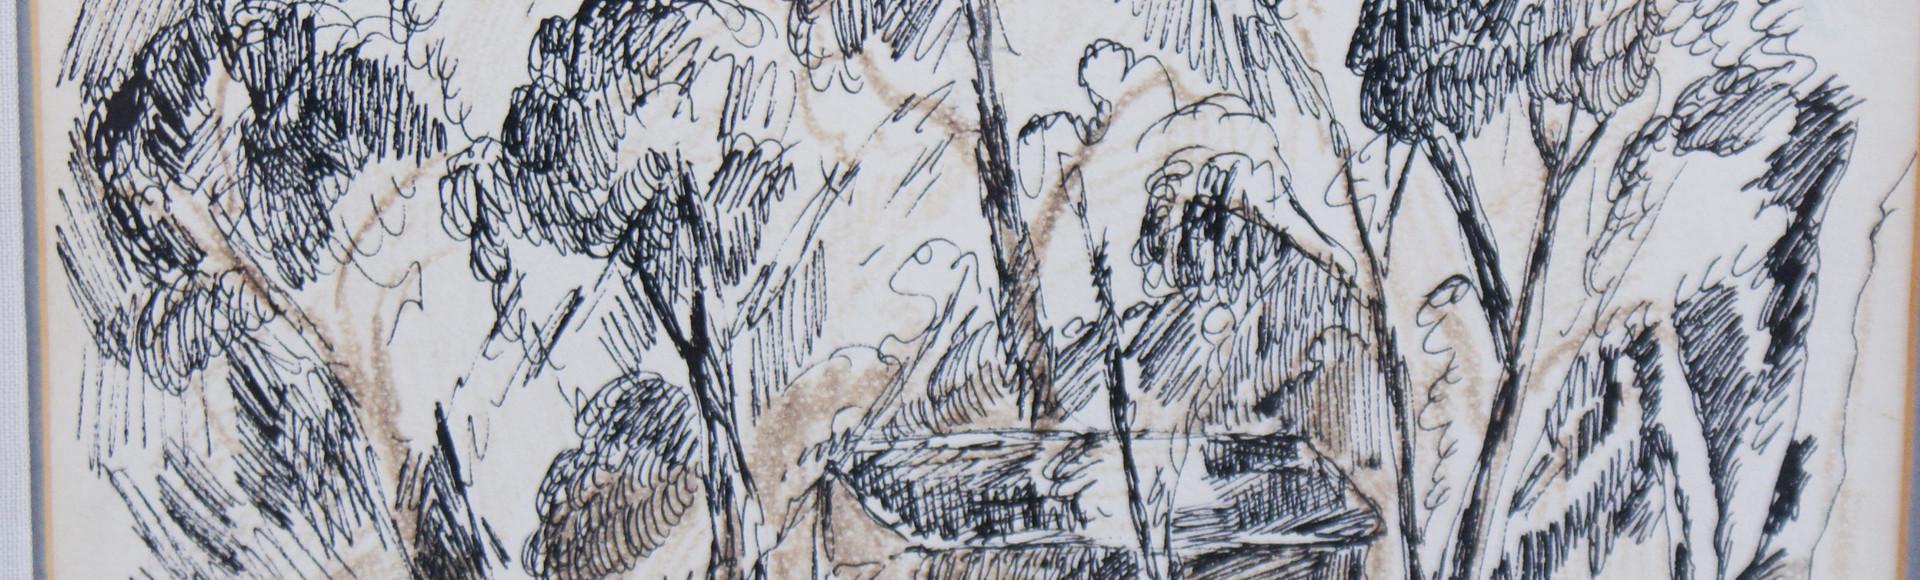 Alfred Morang (1901-1958) Mixed Midea on Paper 1955